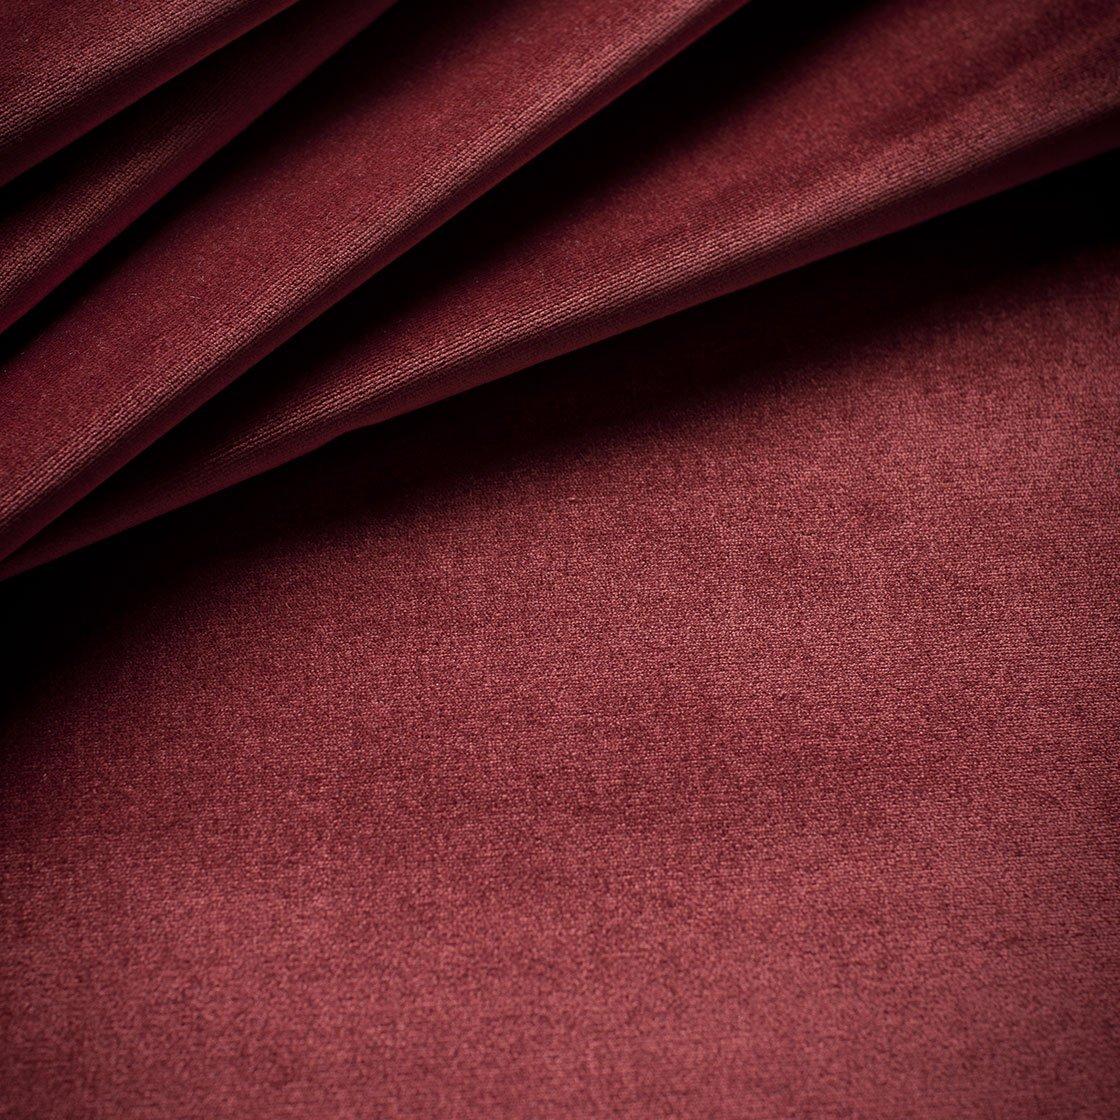 Capri Silk Velvet - Toledo Red - Beaumont & Fletcher - Beaumont & Fletcher